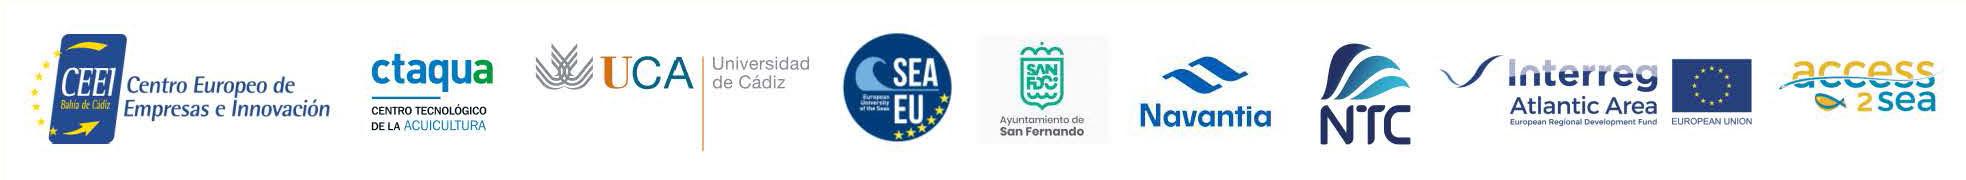 Banner logos DEF